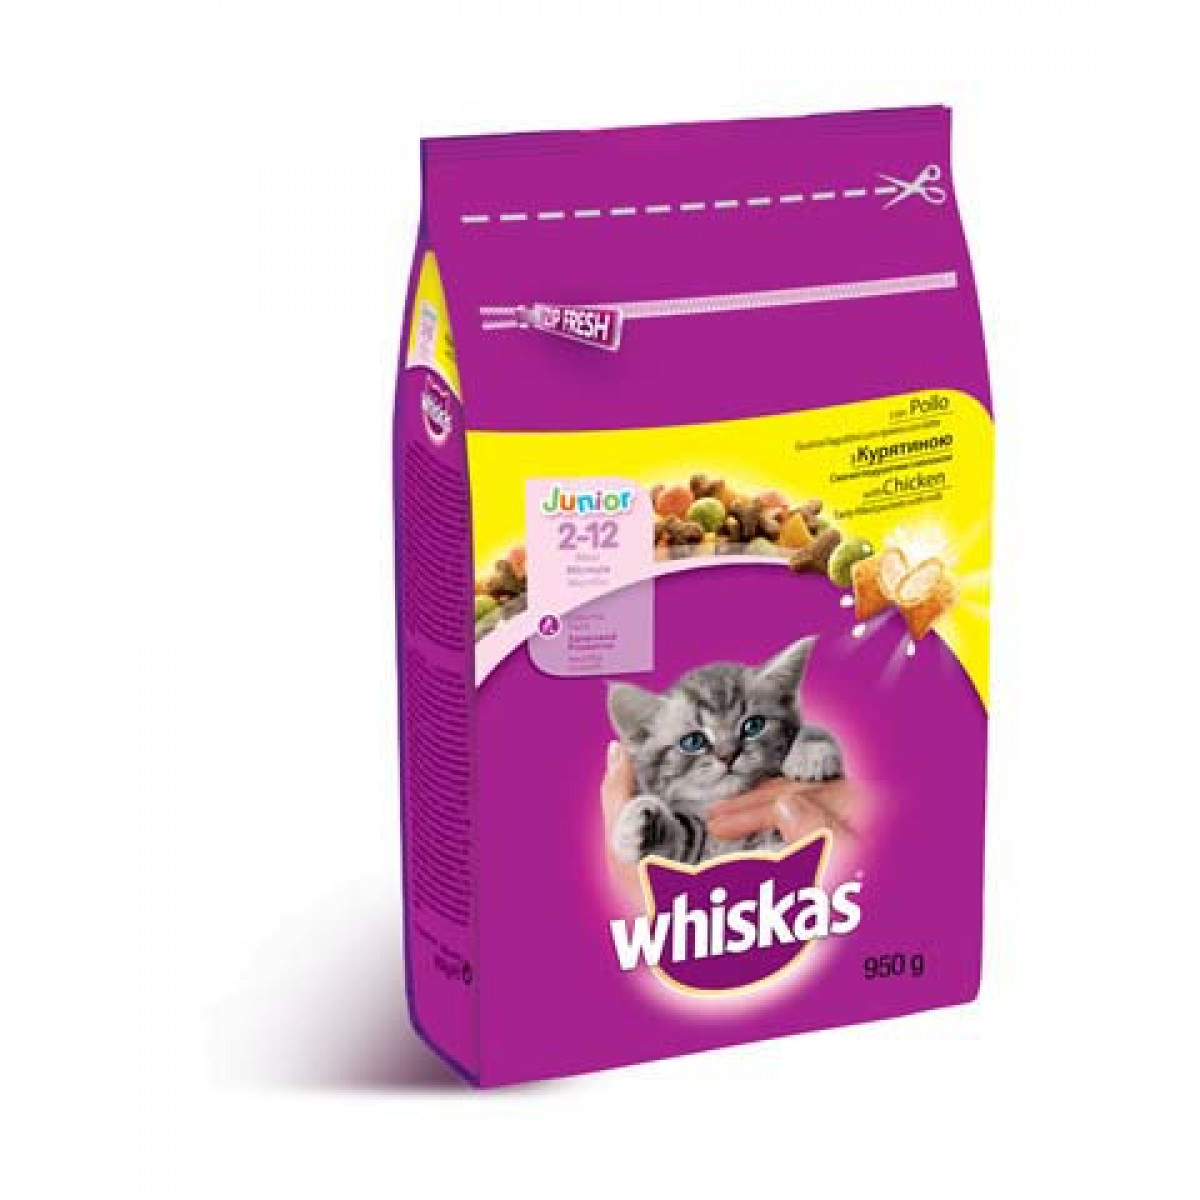 Image of Whiskas Dry Junior Pollo: 950 gr